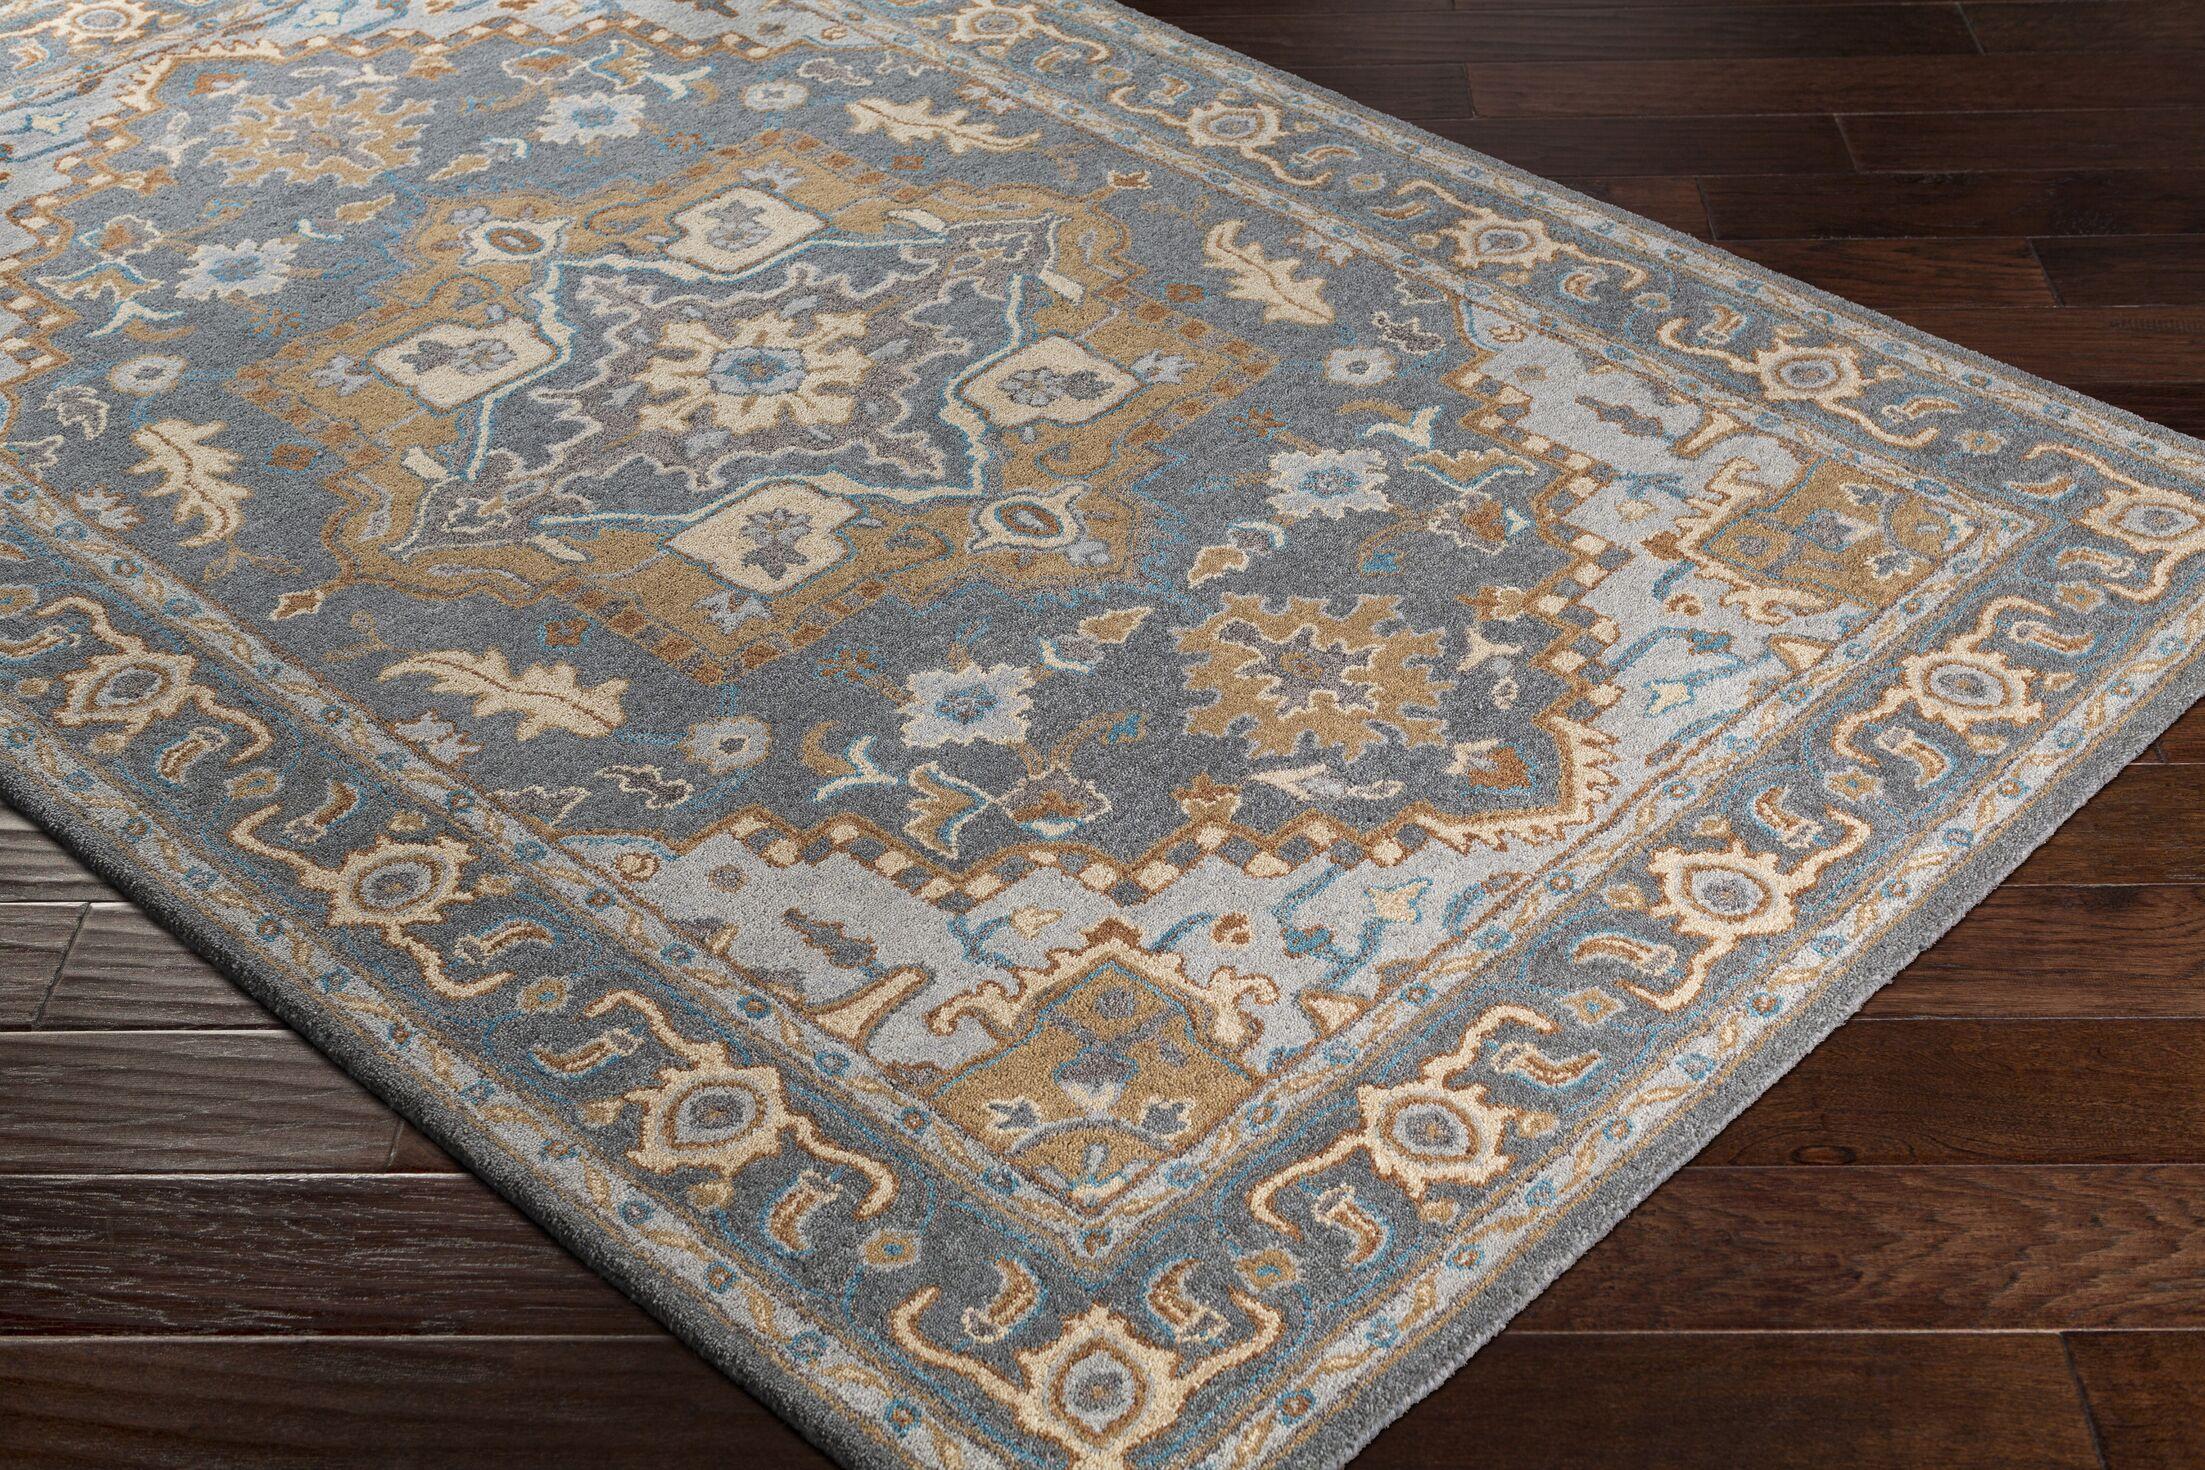 Pewitt Hand-Tufted Medium Wool Gray/Tan Area Rug Rug Size: Rectangle 5' x 7'6